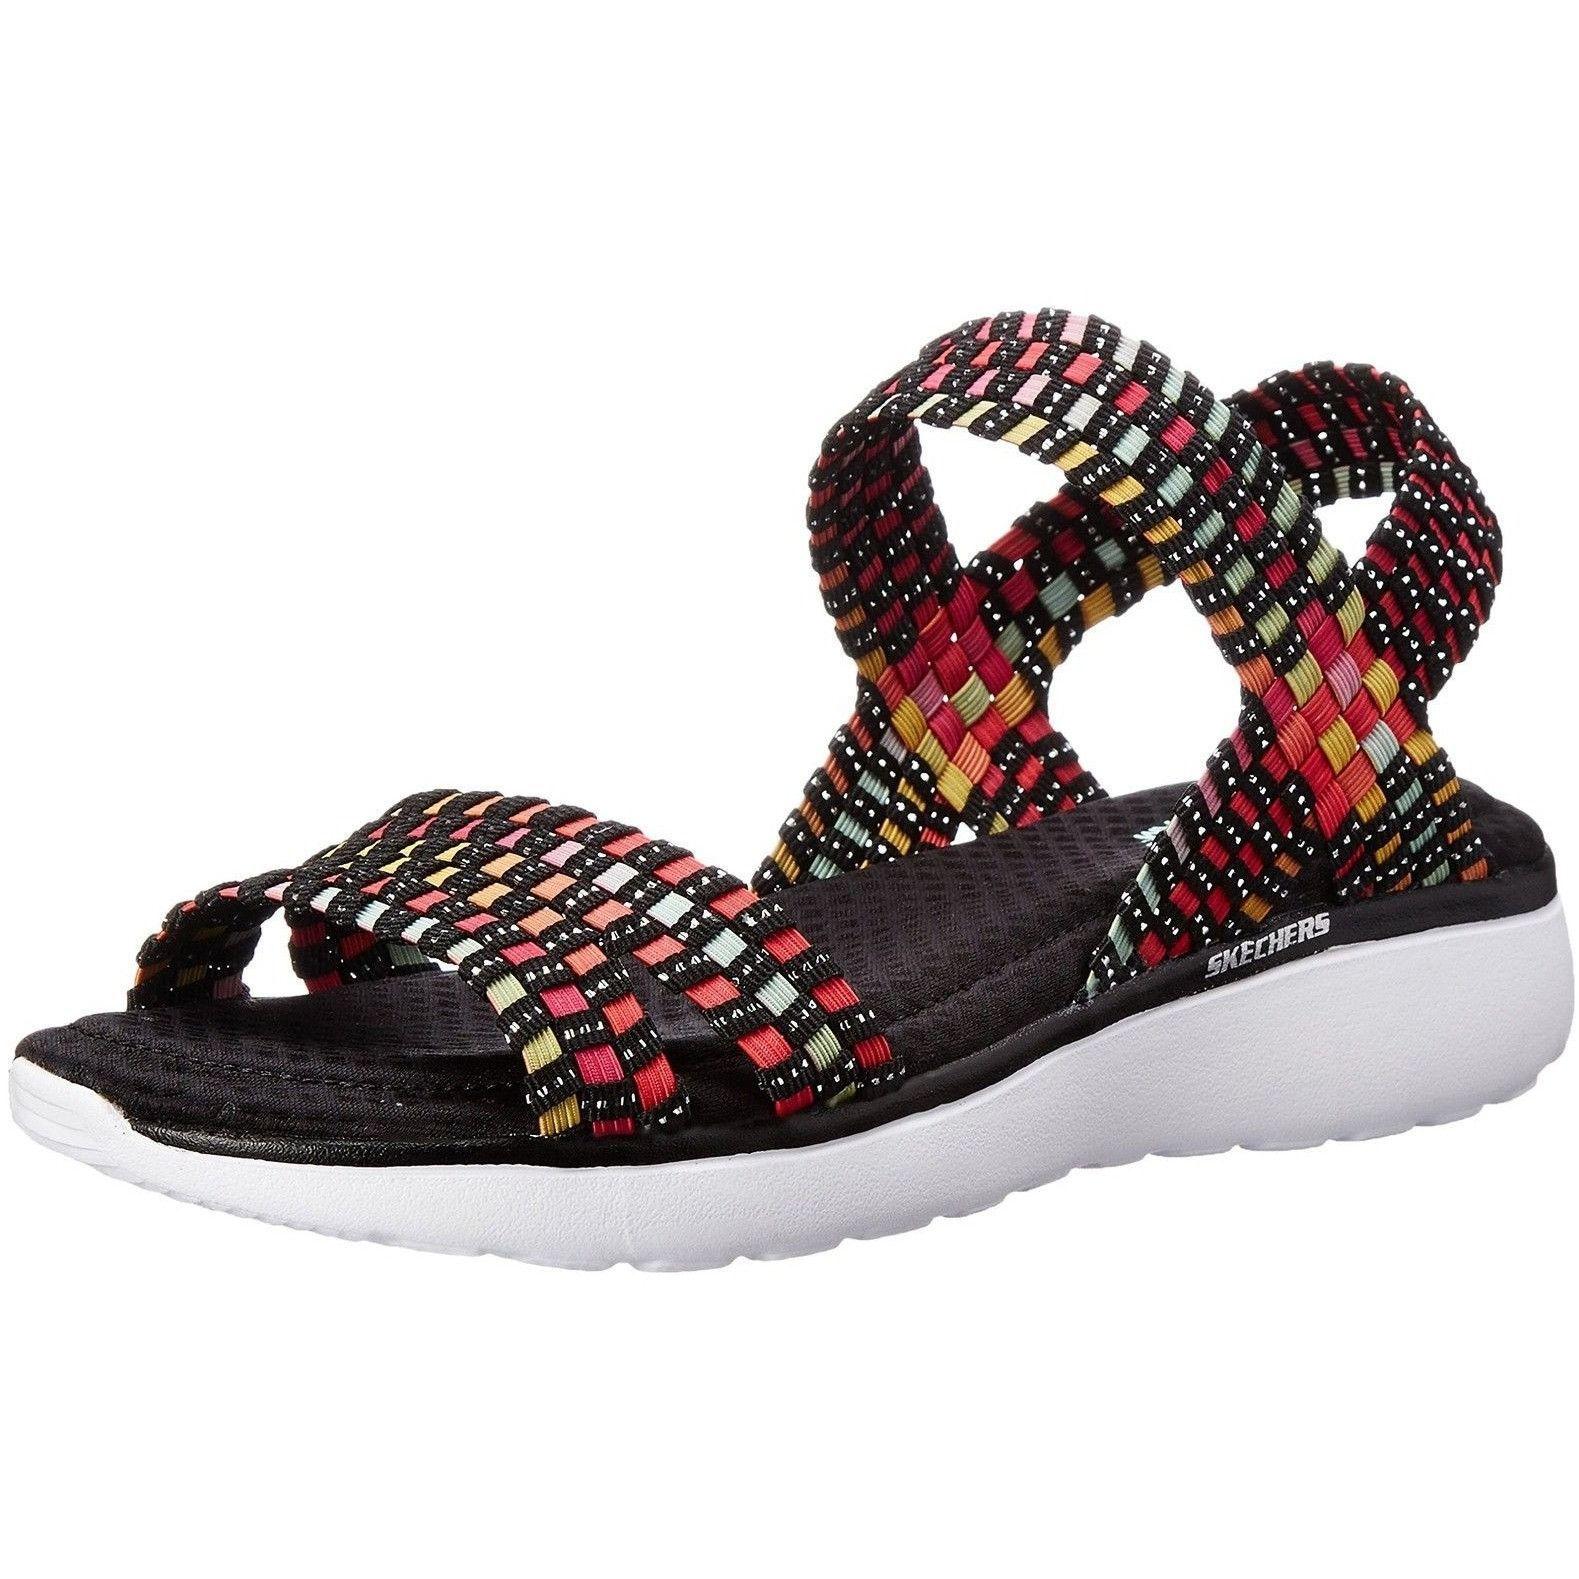 Skechers Counterpart Breeze Beatbox Sandals (Women)   Bags, Shoes ... 7a767c850a28